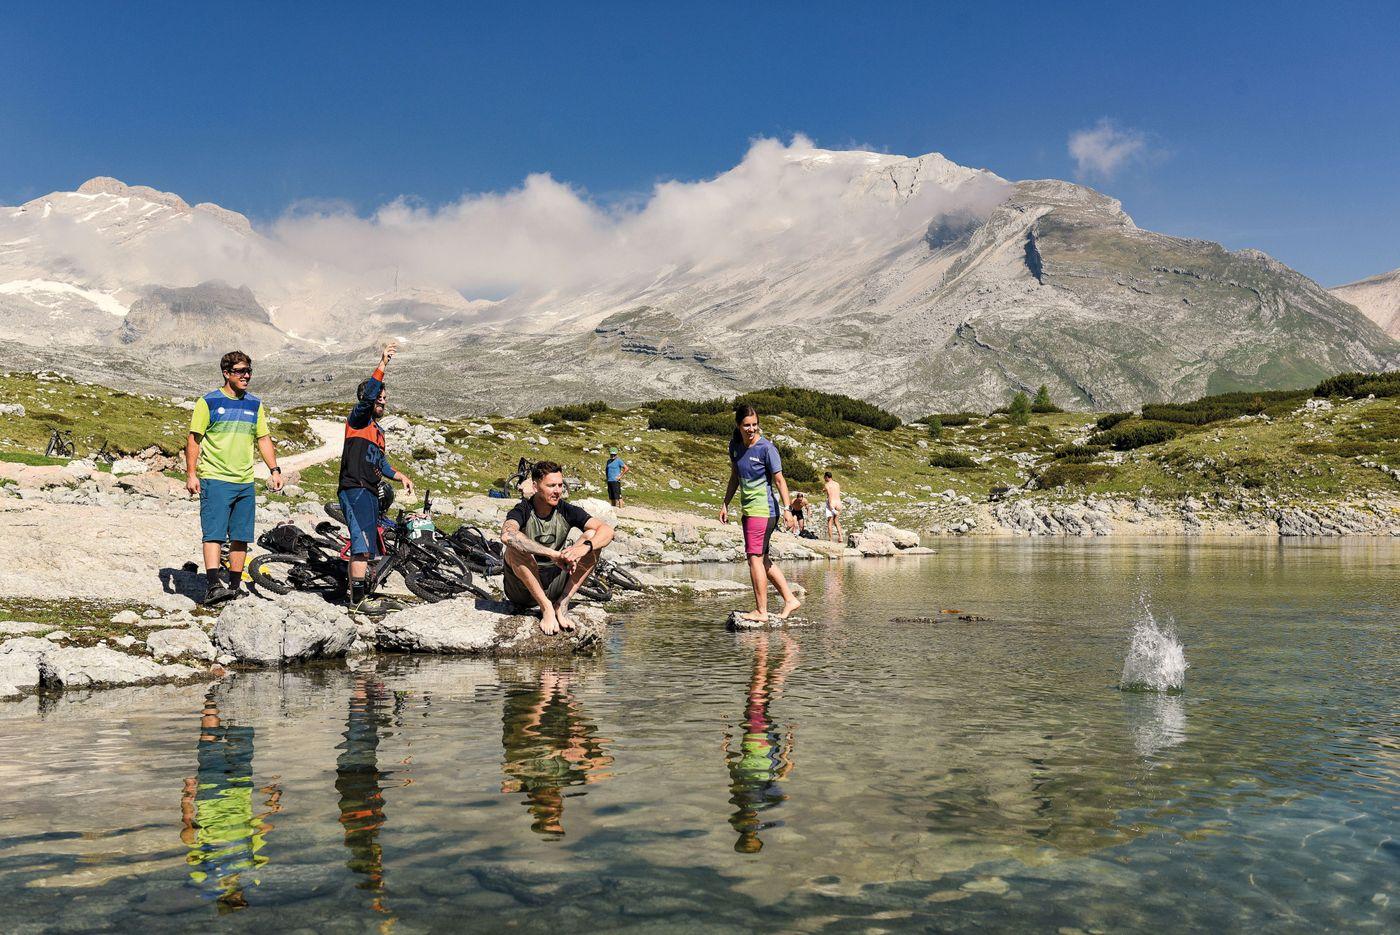 Sankt-Vigil-Dolomiten-Born-19-02-Limosee